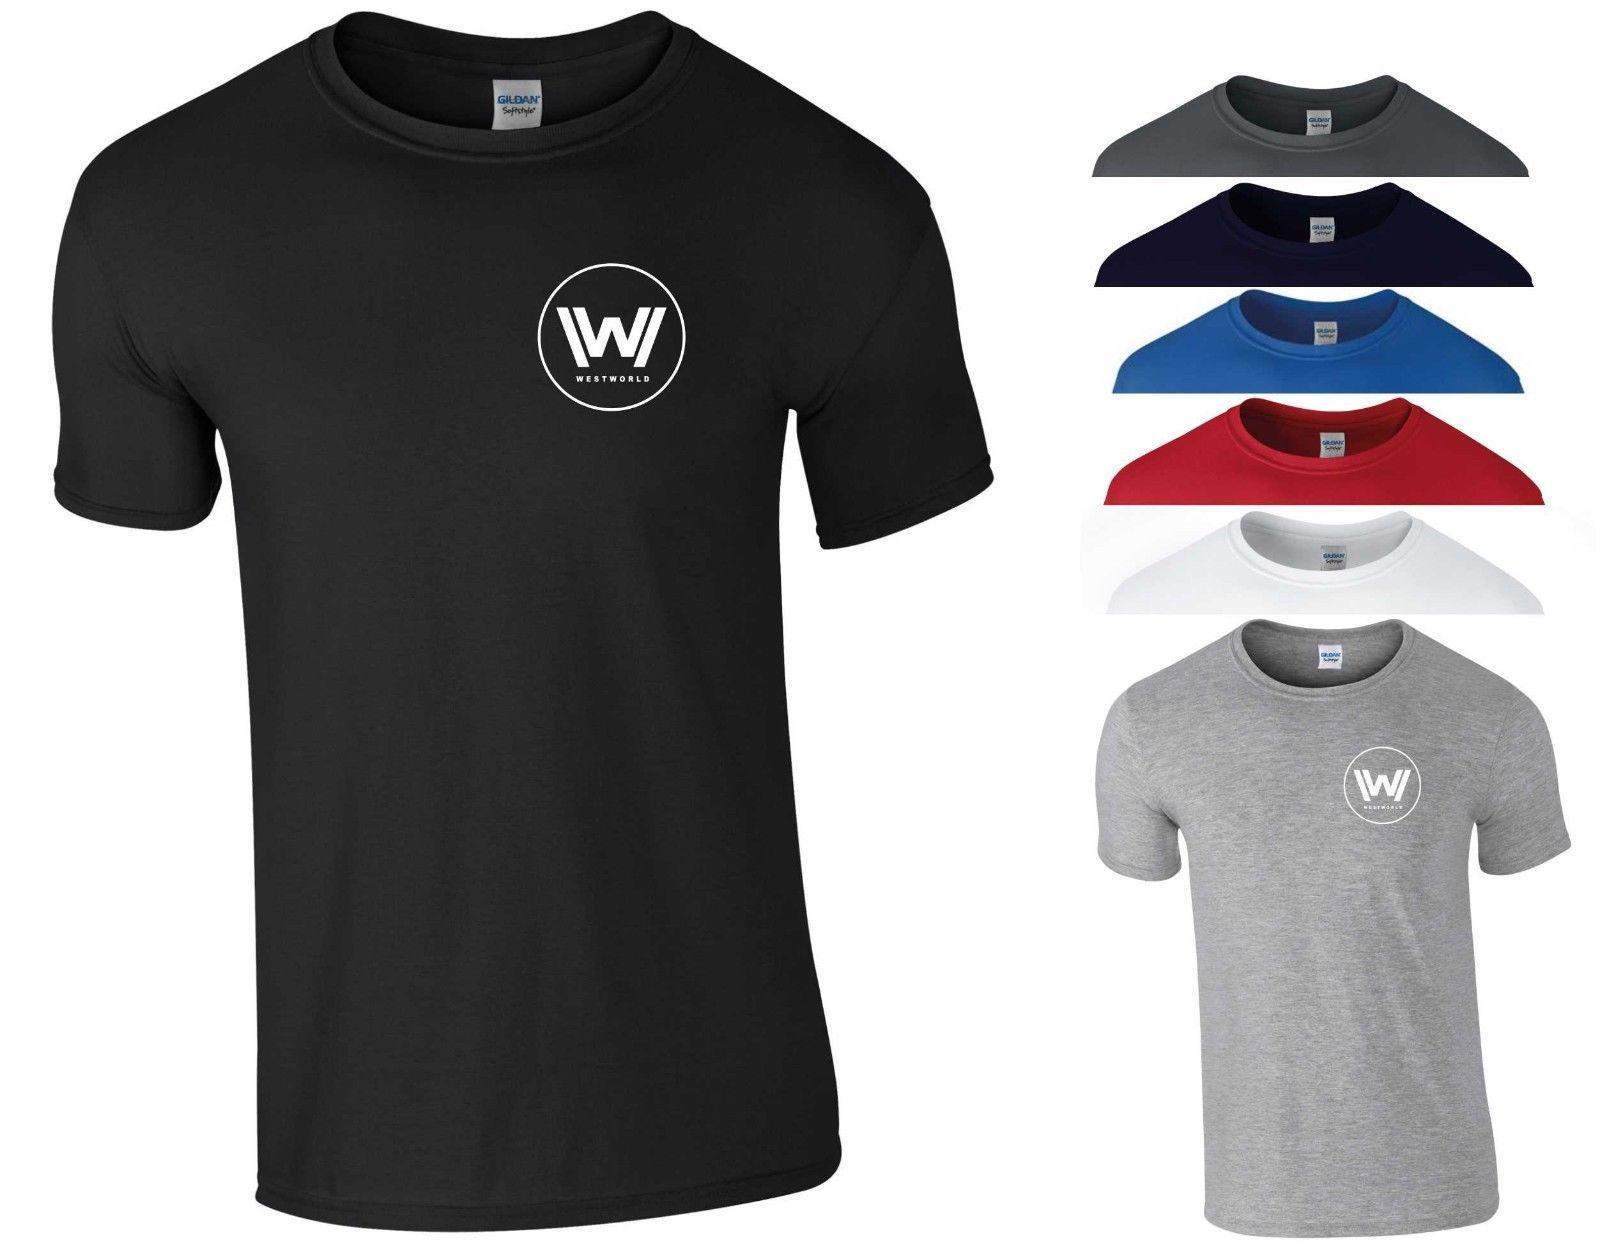 WestWorld T Shirt HBO TV Series Season 2 West World Alien Nerd Geek Gift  Men Top